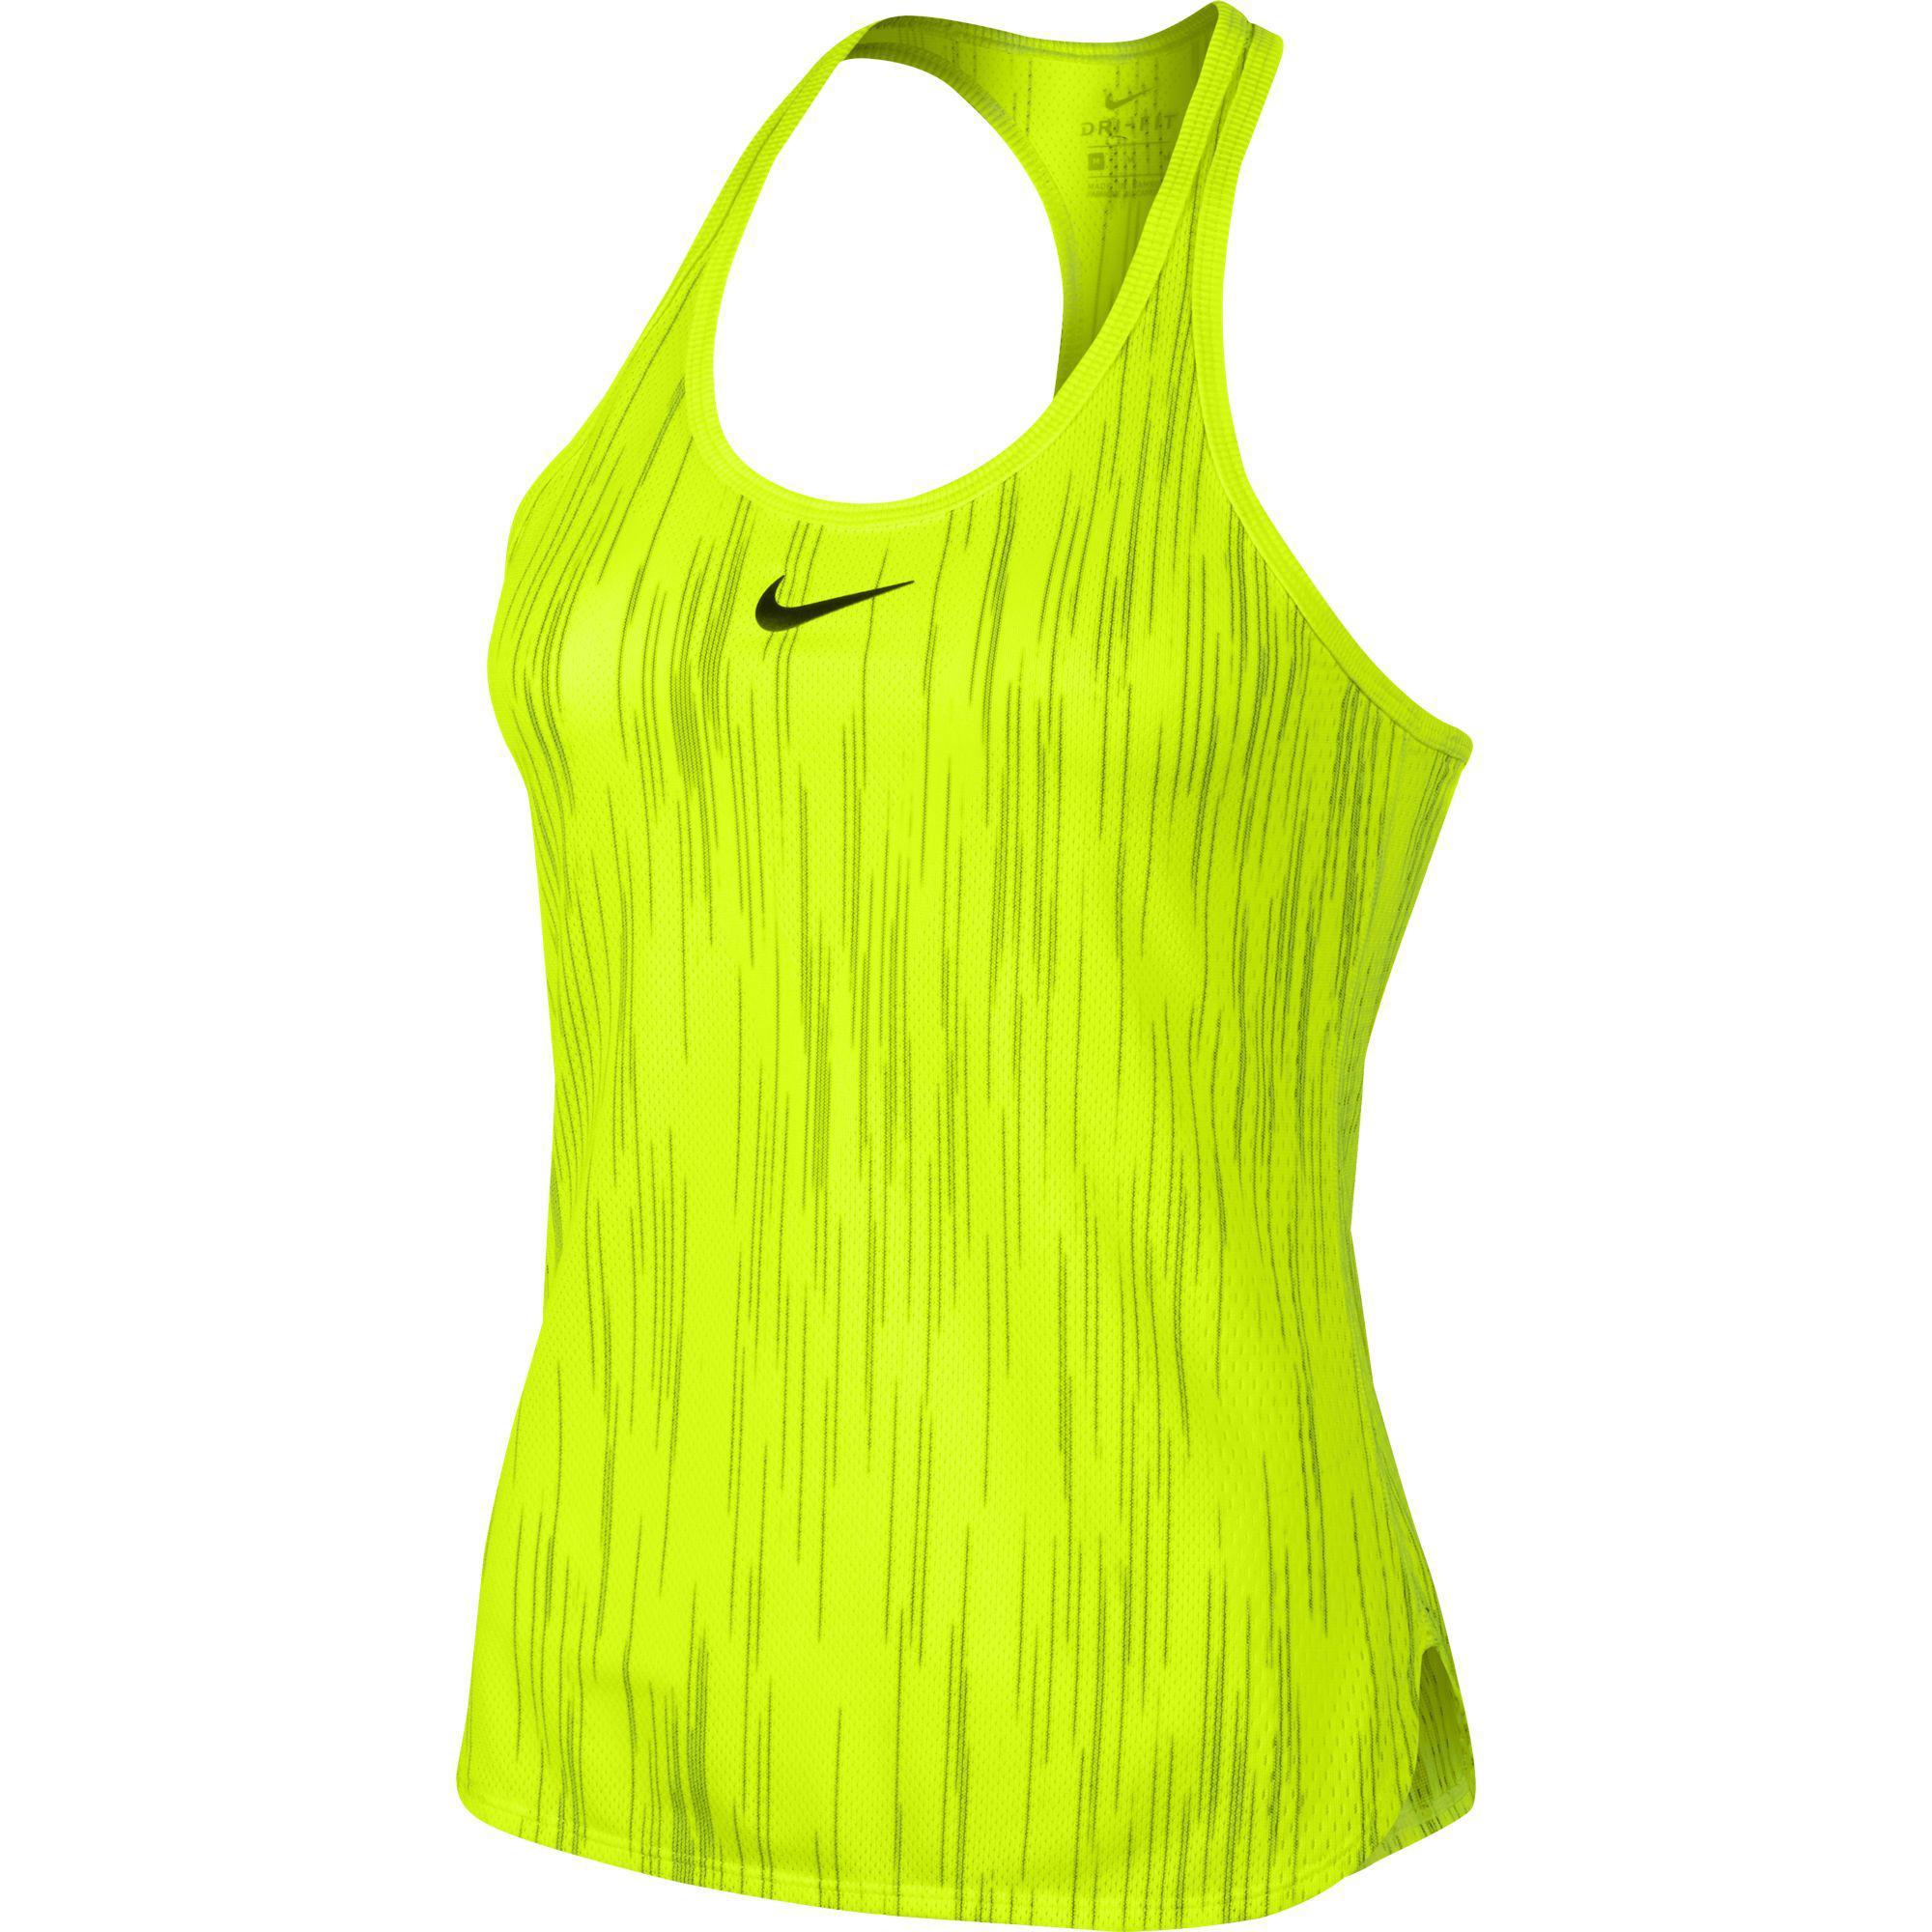 f8d296e1 Nike Womens Flex Dry Slam Tank Top - Volt/Black - Tennisnuts.com